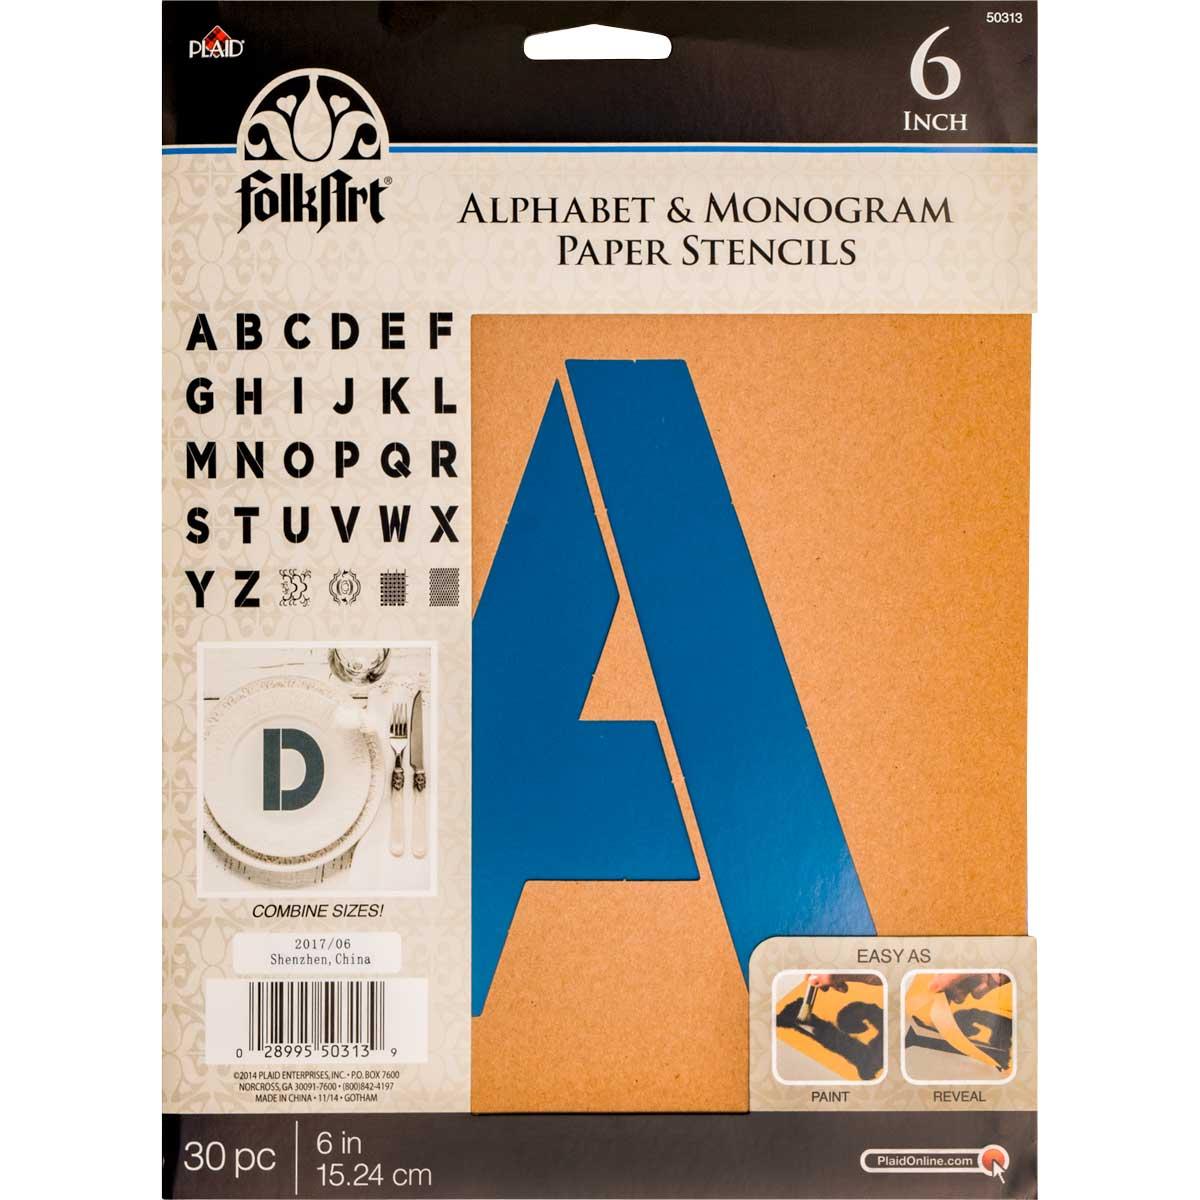 FolkArt ® Alphabet & Monogram Paper Stencils - Bold Font, 6